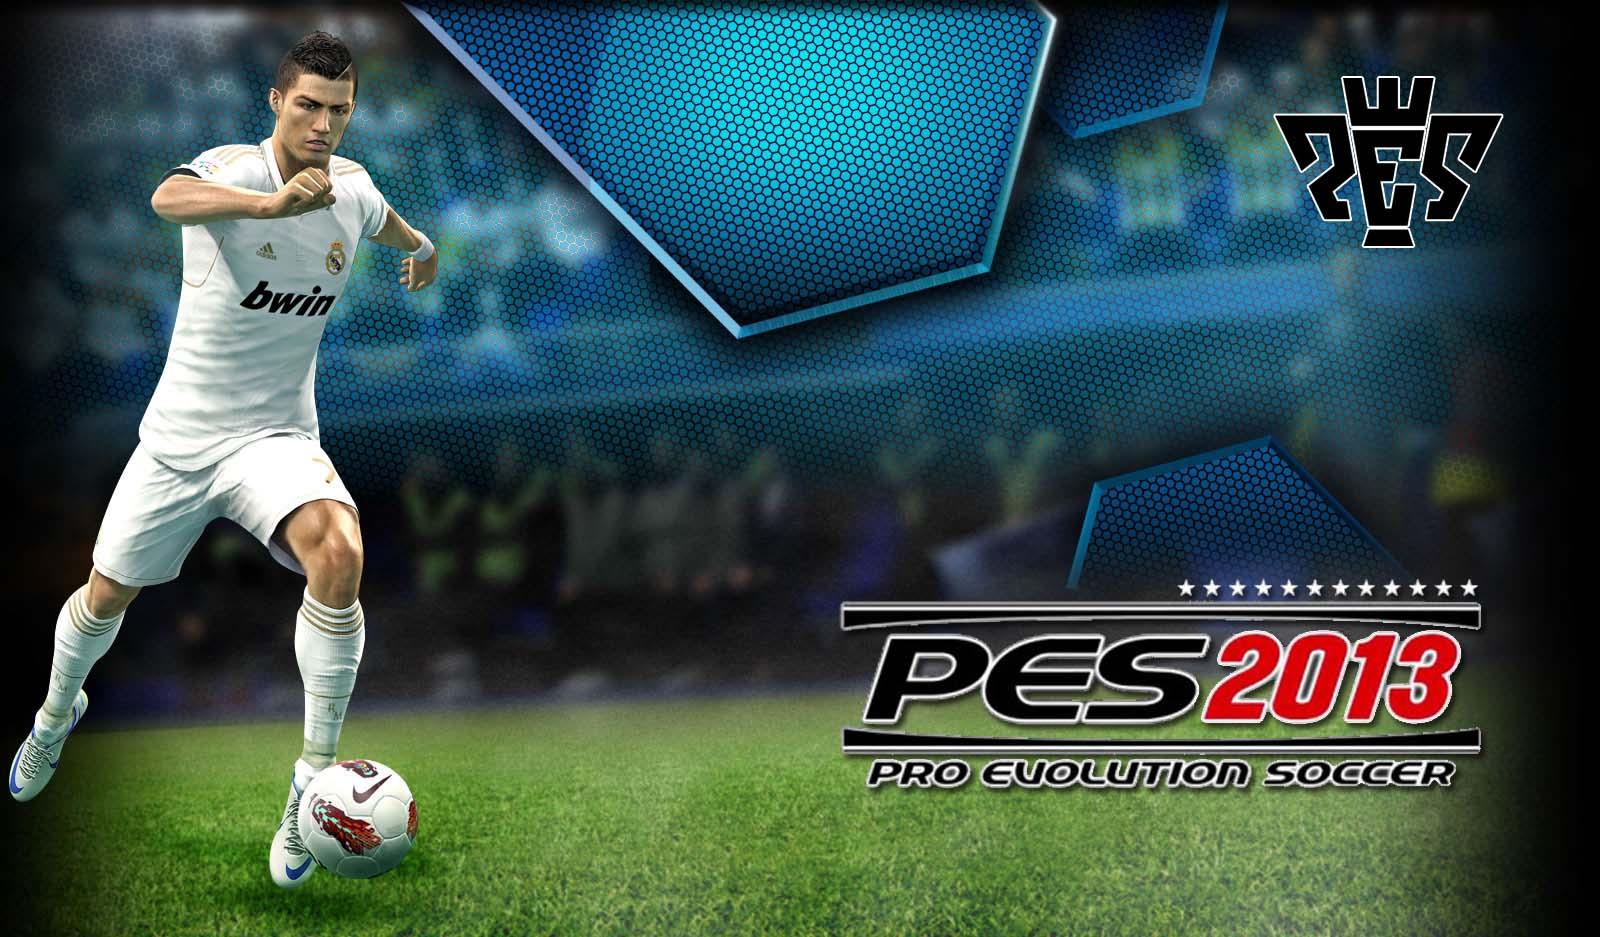 Download PES 2013